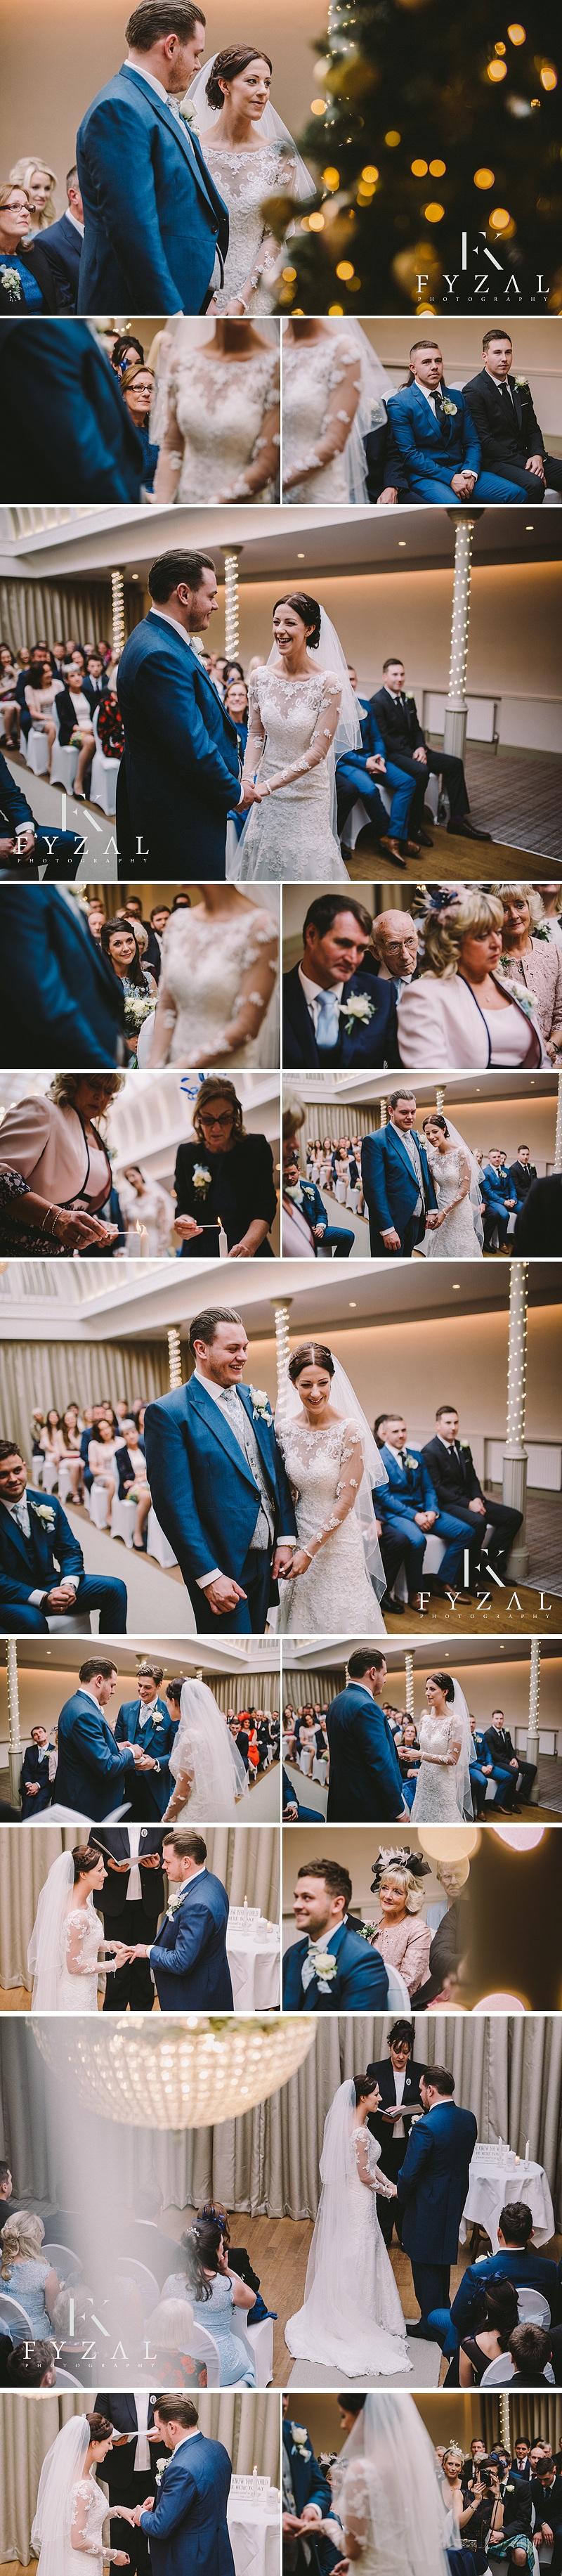 161203-Ellie-Simon-Wedding-05.jpg